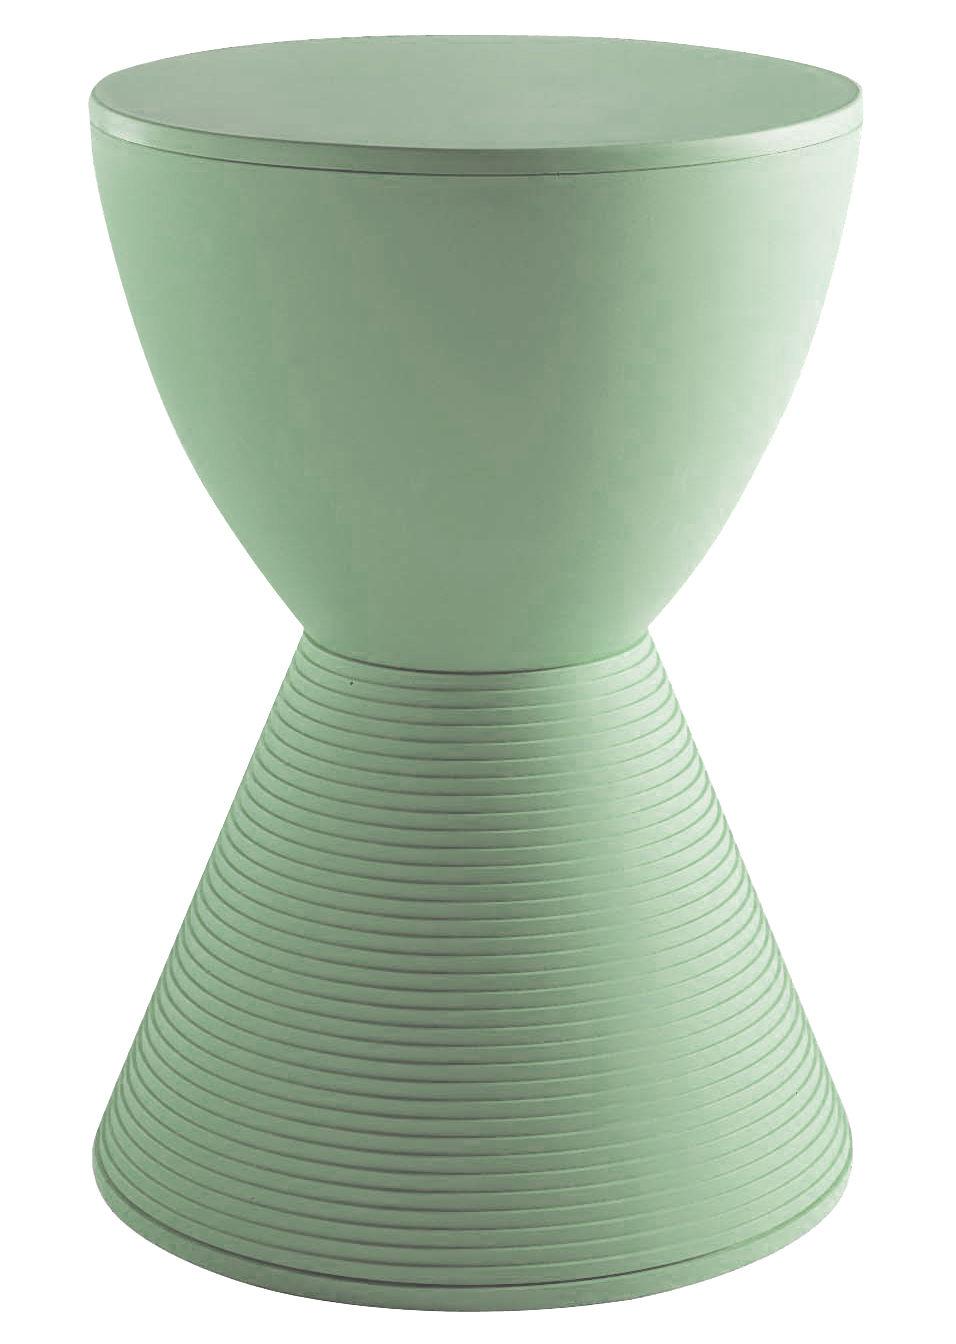 Arredamento - Sgabelli - Sgabello Prince AHA di Kartell - Verde finocchio - Polipropilene